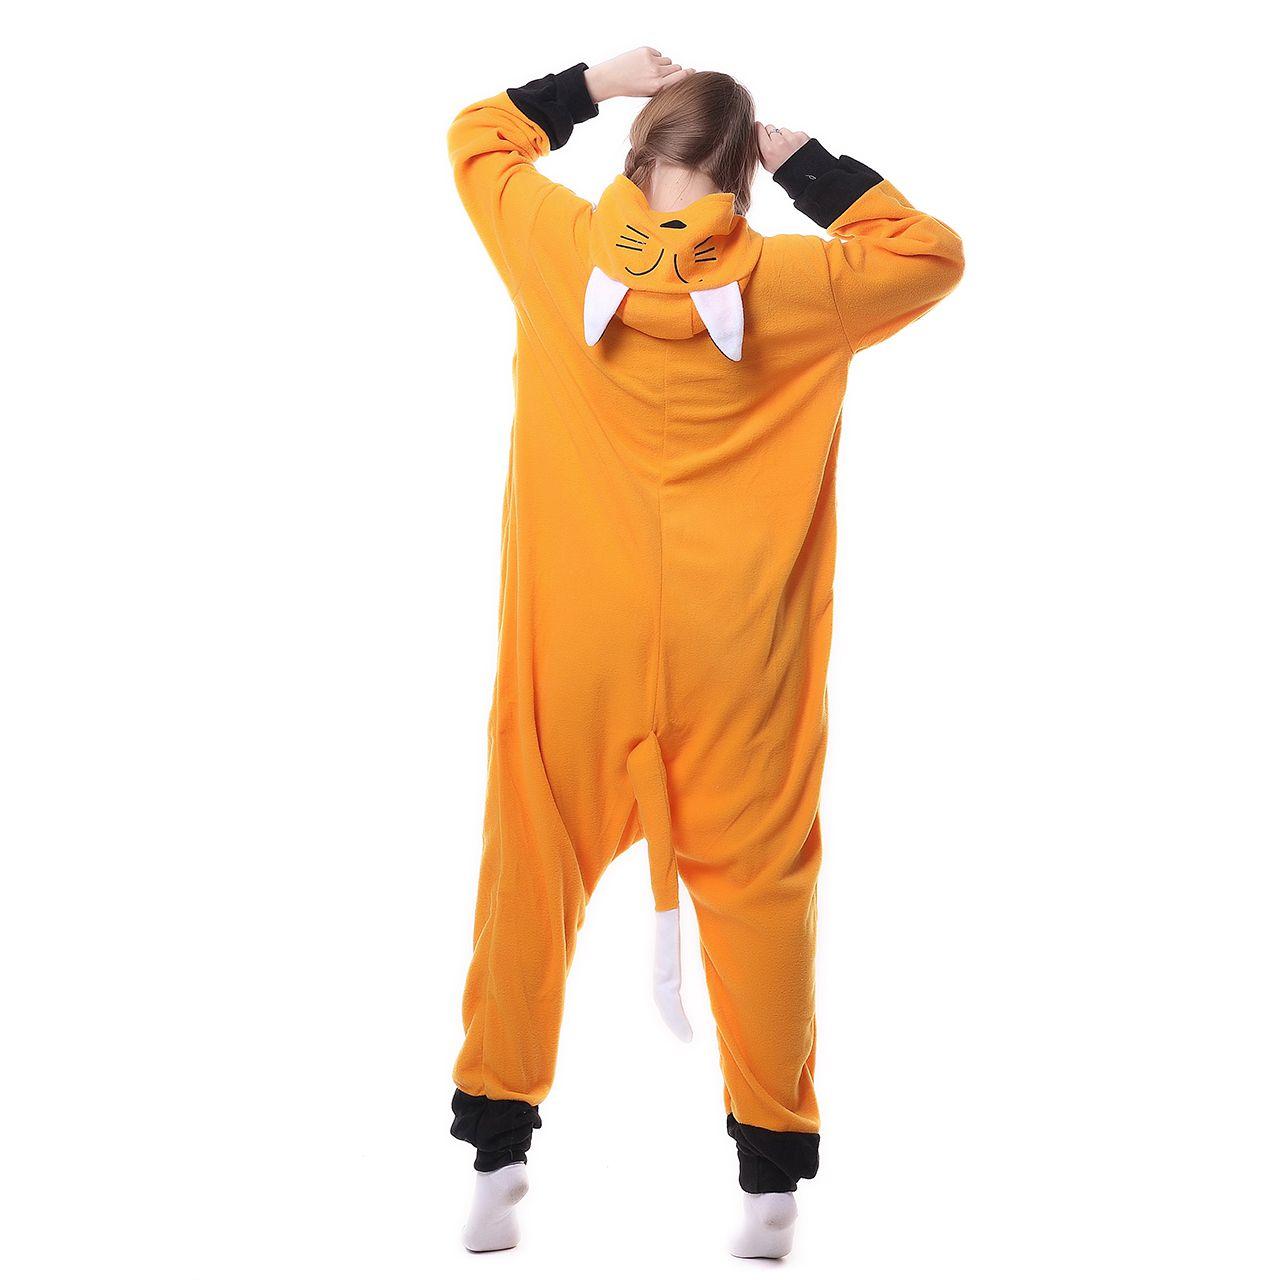 2017 Lady Adult Hooded Animal Pigiama Orange Fox Winter Pigiama Set Fleece Home Sleep Wear Abbigliamento Cosplay Halloween